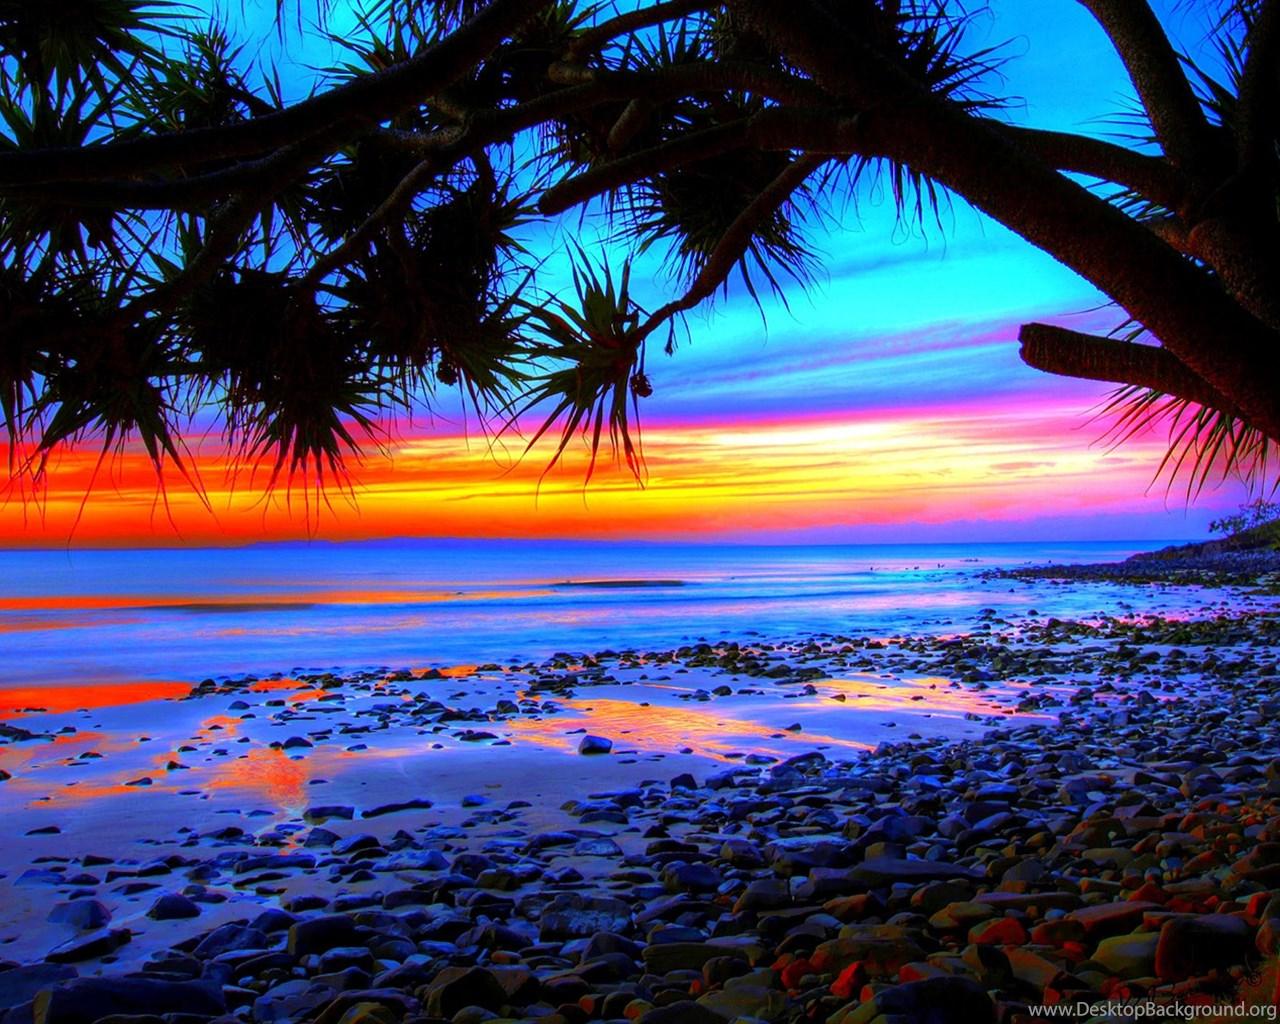 Hd Tropical Island Beach Paradise Wallpapers And Backgrounds: Tropical Beach Sunset Wallpapers 09, HD Desktop Wallpapers